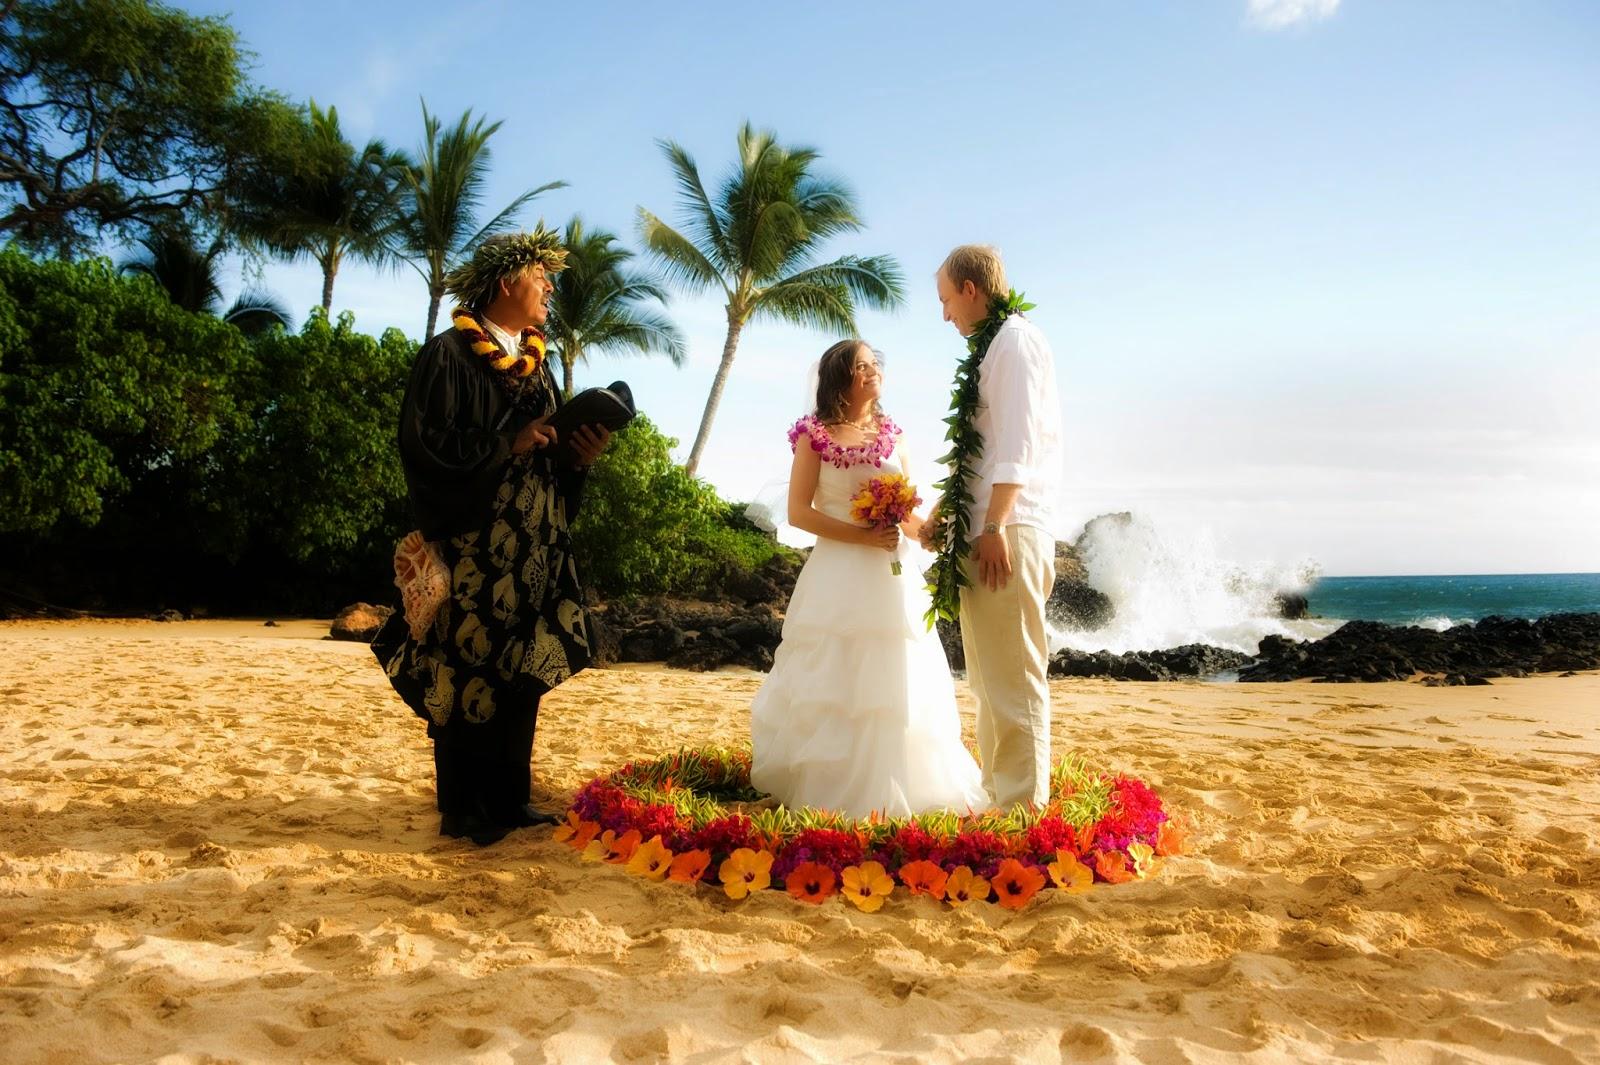 maui wedding photography, maui wedding photographer, maui wedding photographers, makena cove beach wedding